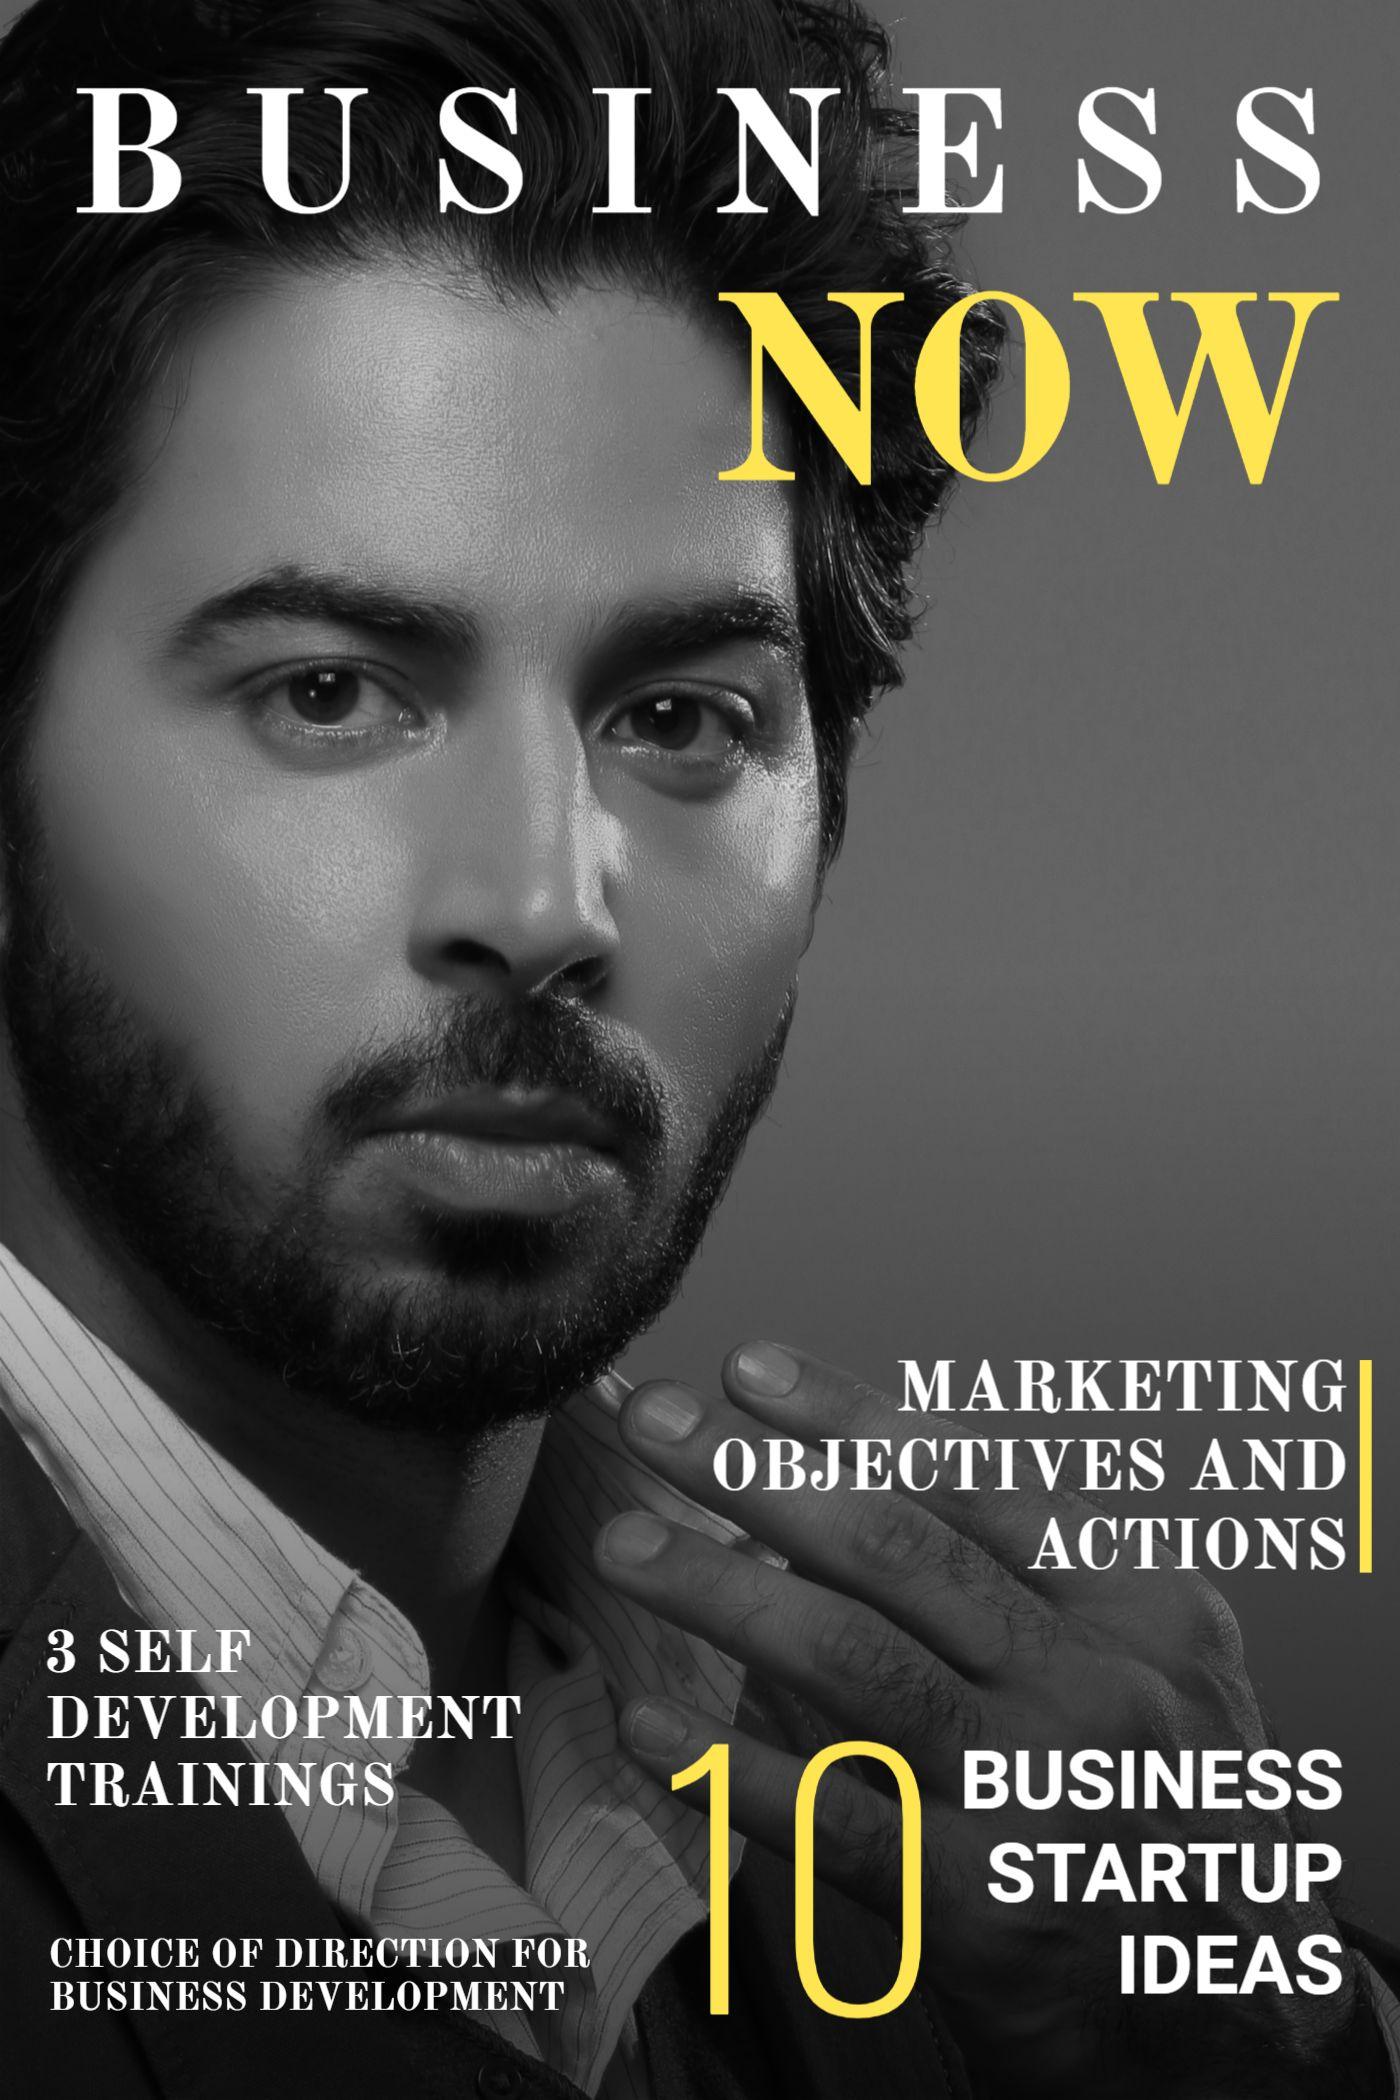 Business Development Magazine Cover Template